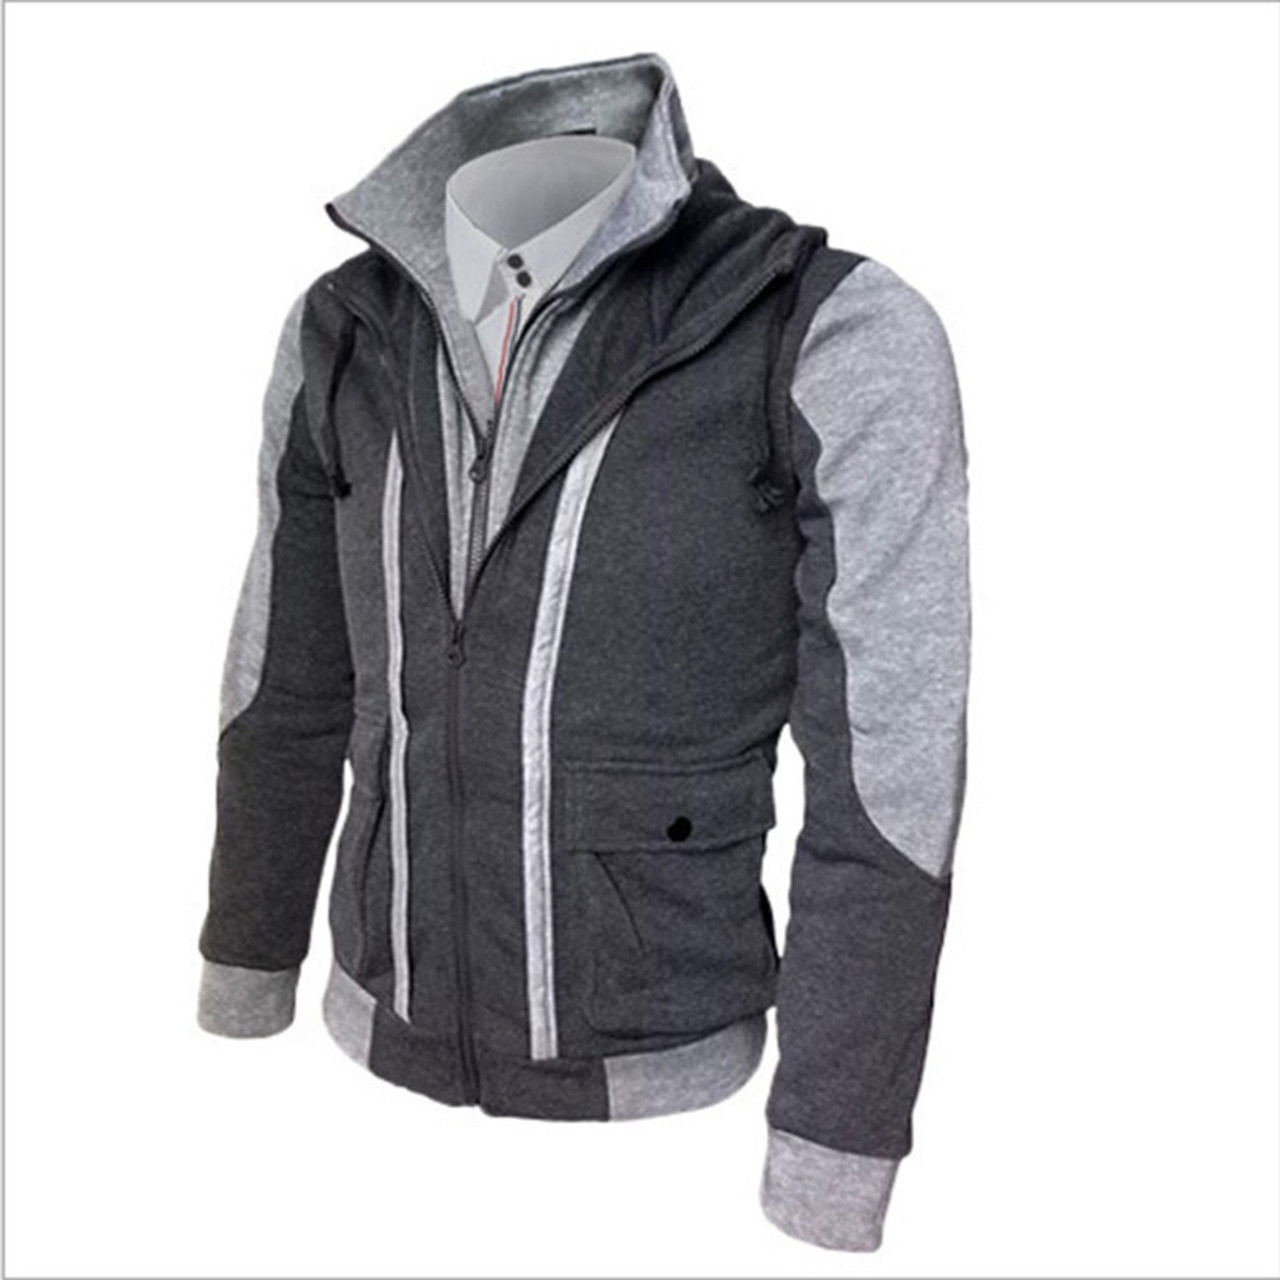 f5978112fa38 ... 2018 Hot sales New Fashion Casual Men s Hoodies Sweatshirts Slim Fit Men  Sweatshirts Double Zipper Mens ...